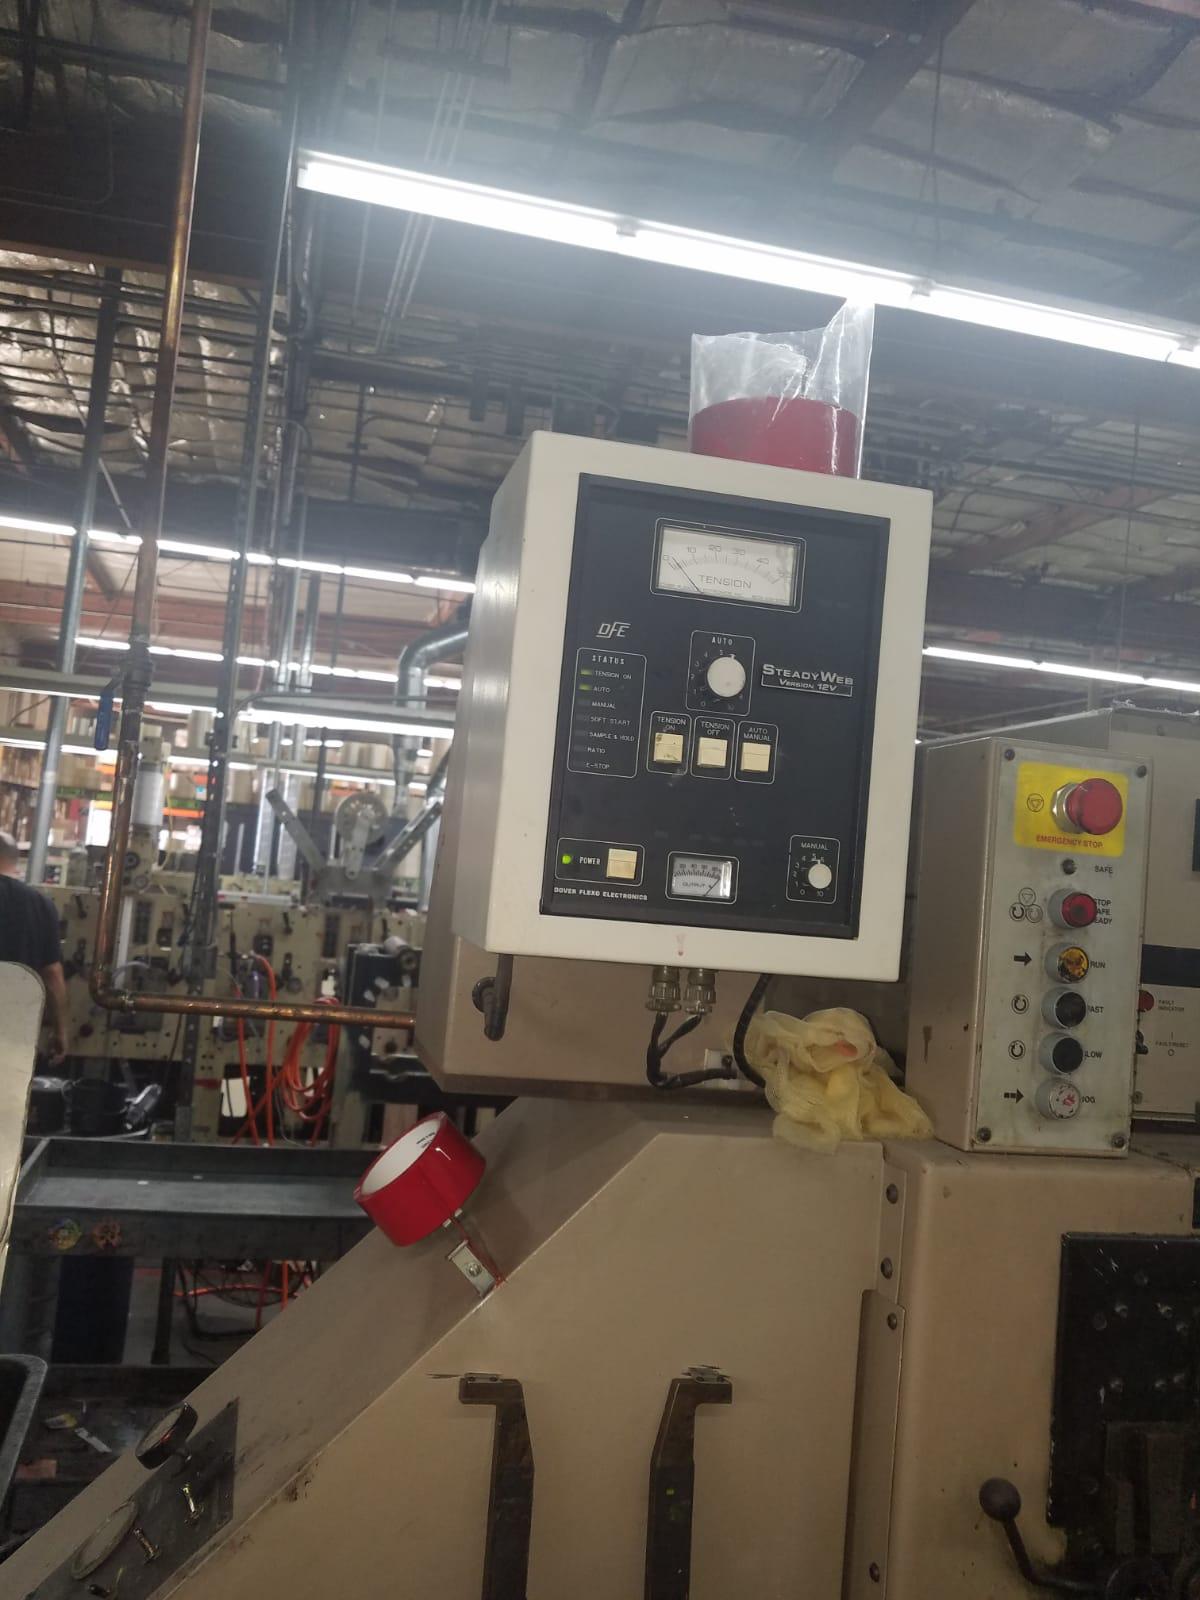 Webtron 750 HQV - Used Flexo Printing Presses and Used Flexographic Equipment-13